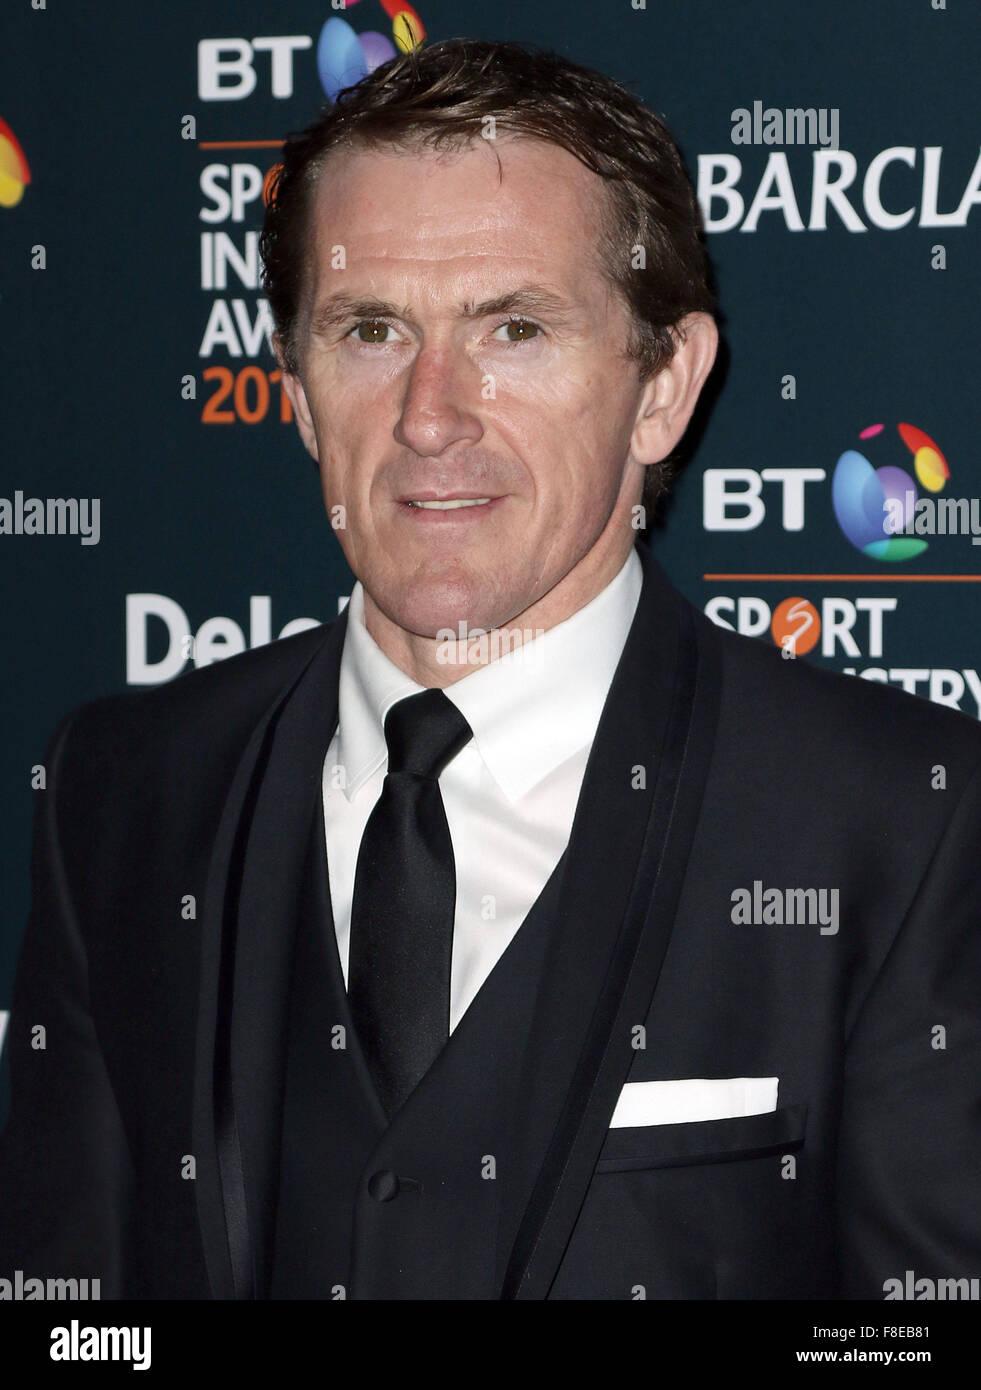 Apr 30, 2015 - London, England, UK - AP McCoy attending BT Sport Industry Awards 2015 at Battersea Evolution - Stock Image